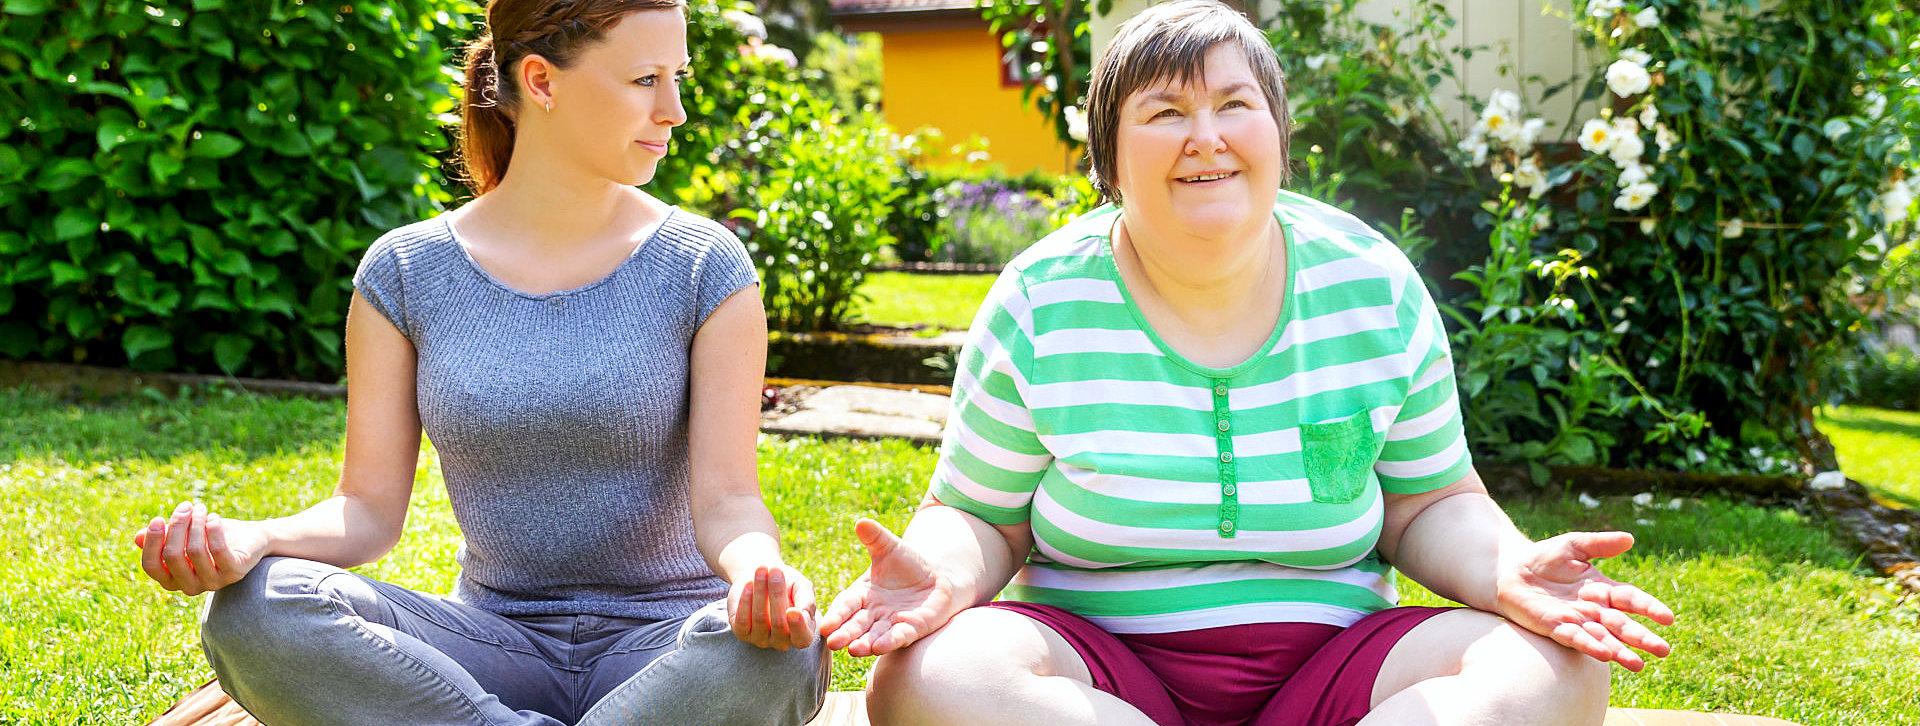 caregiver and senior woman doing meditating